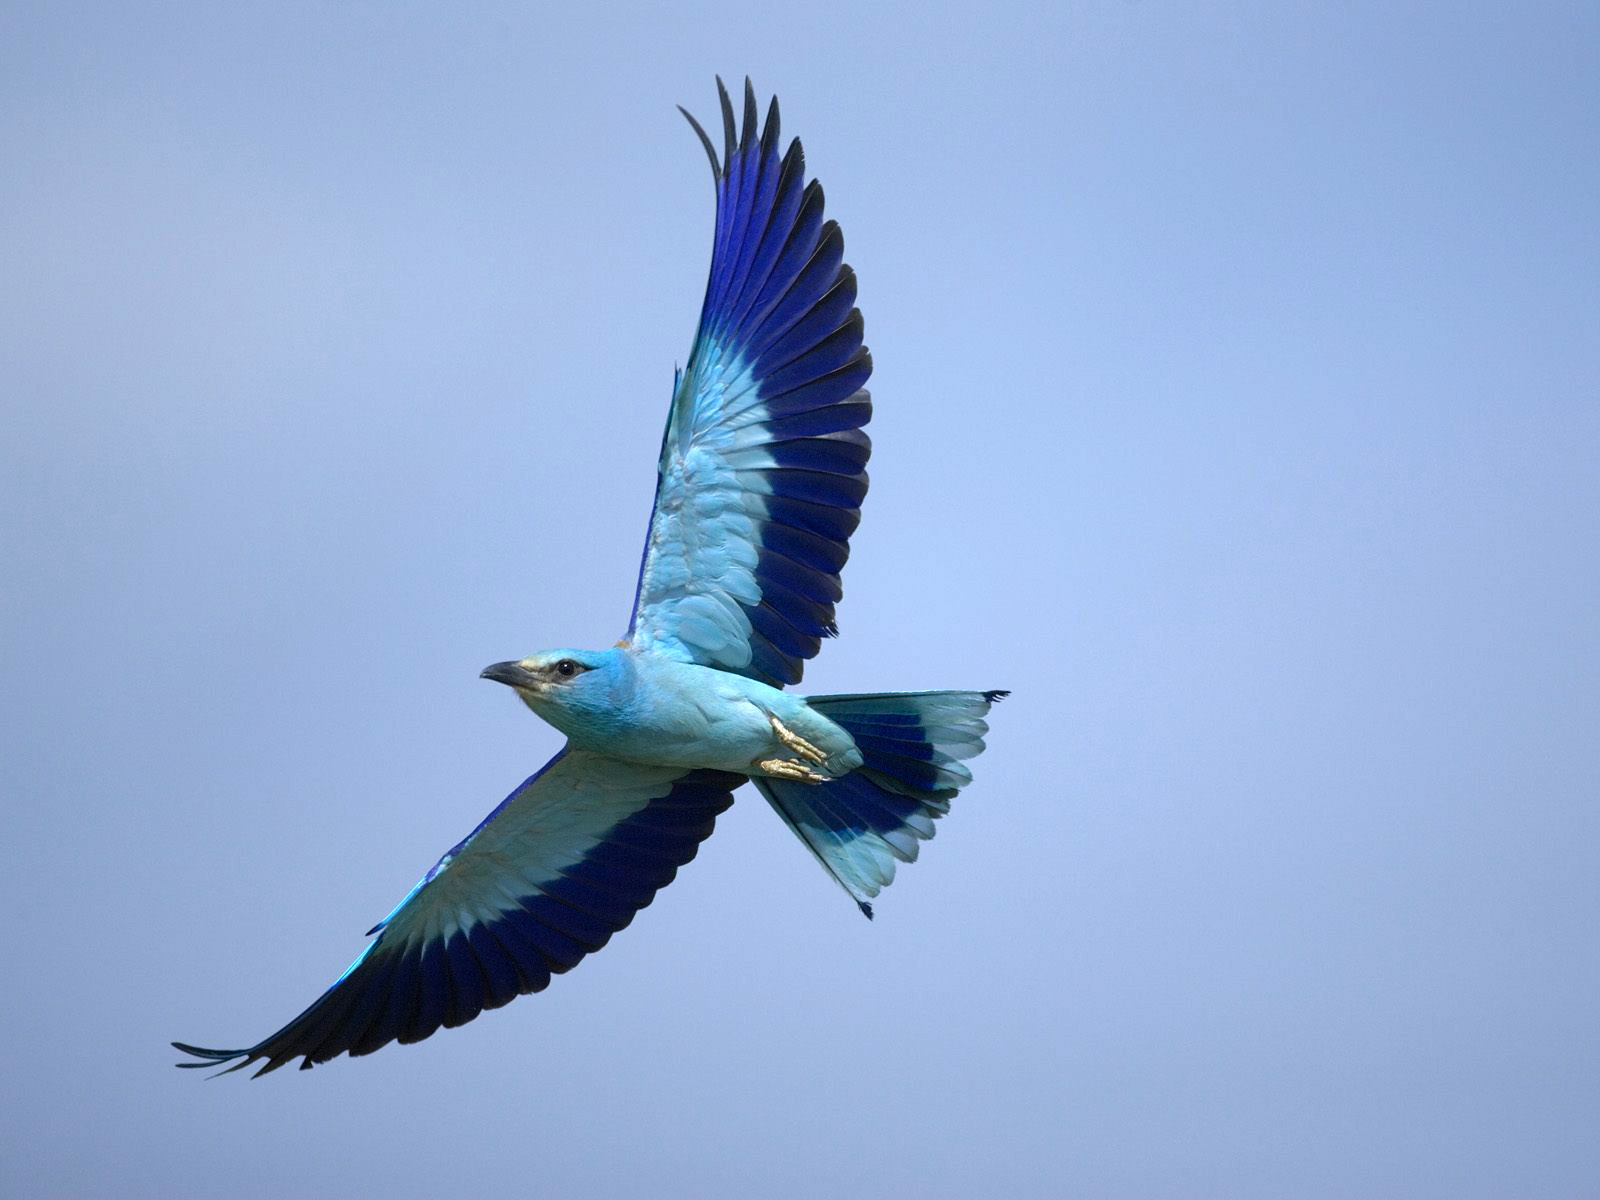 летящая птица картинки